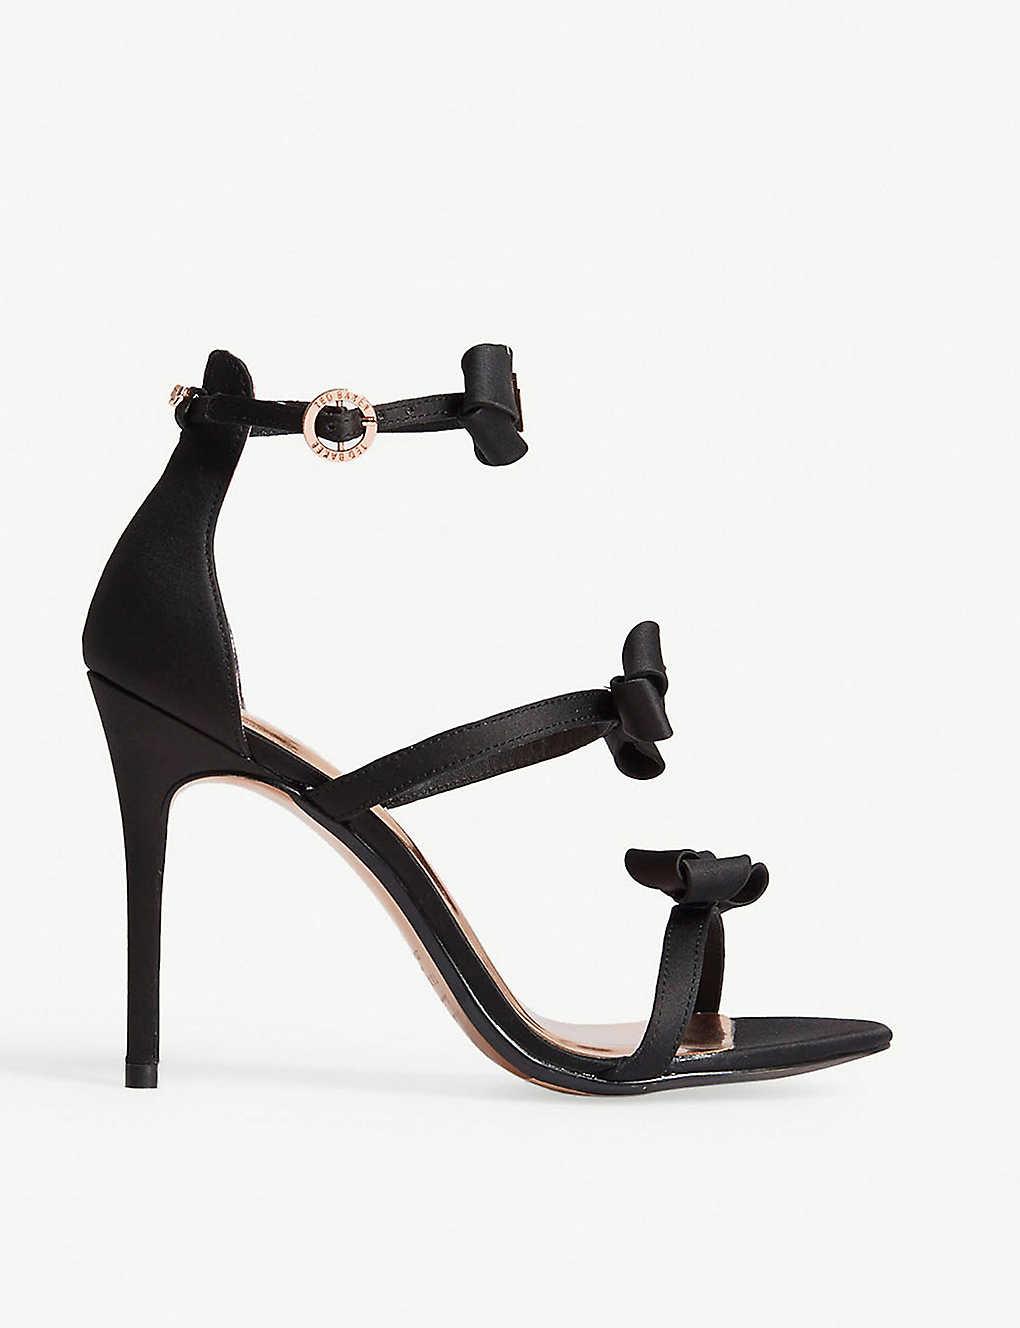 9ba66bf2126 Nuscala heeled sandals zoom  Nuscala heeled sandals zoom ...